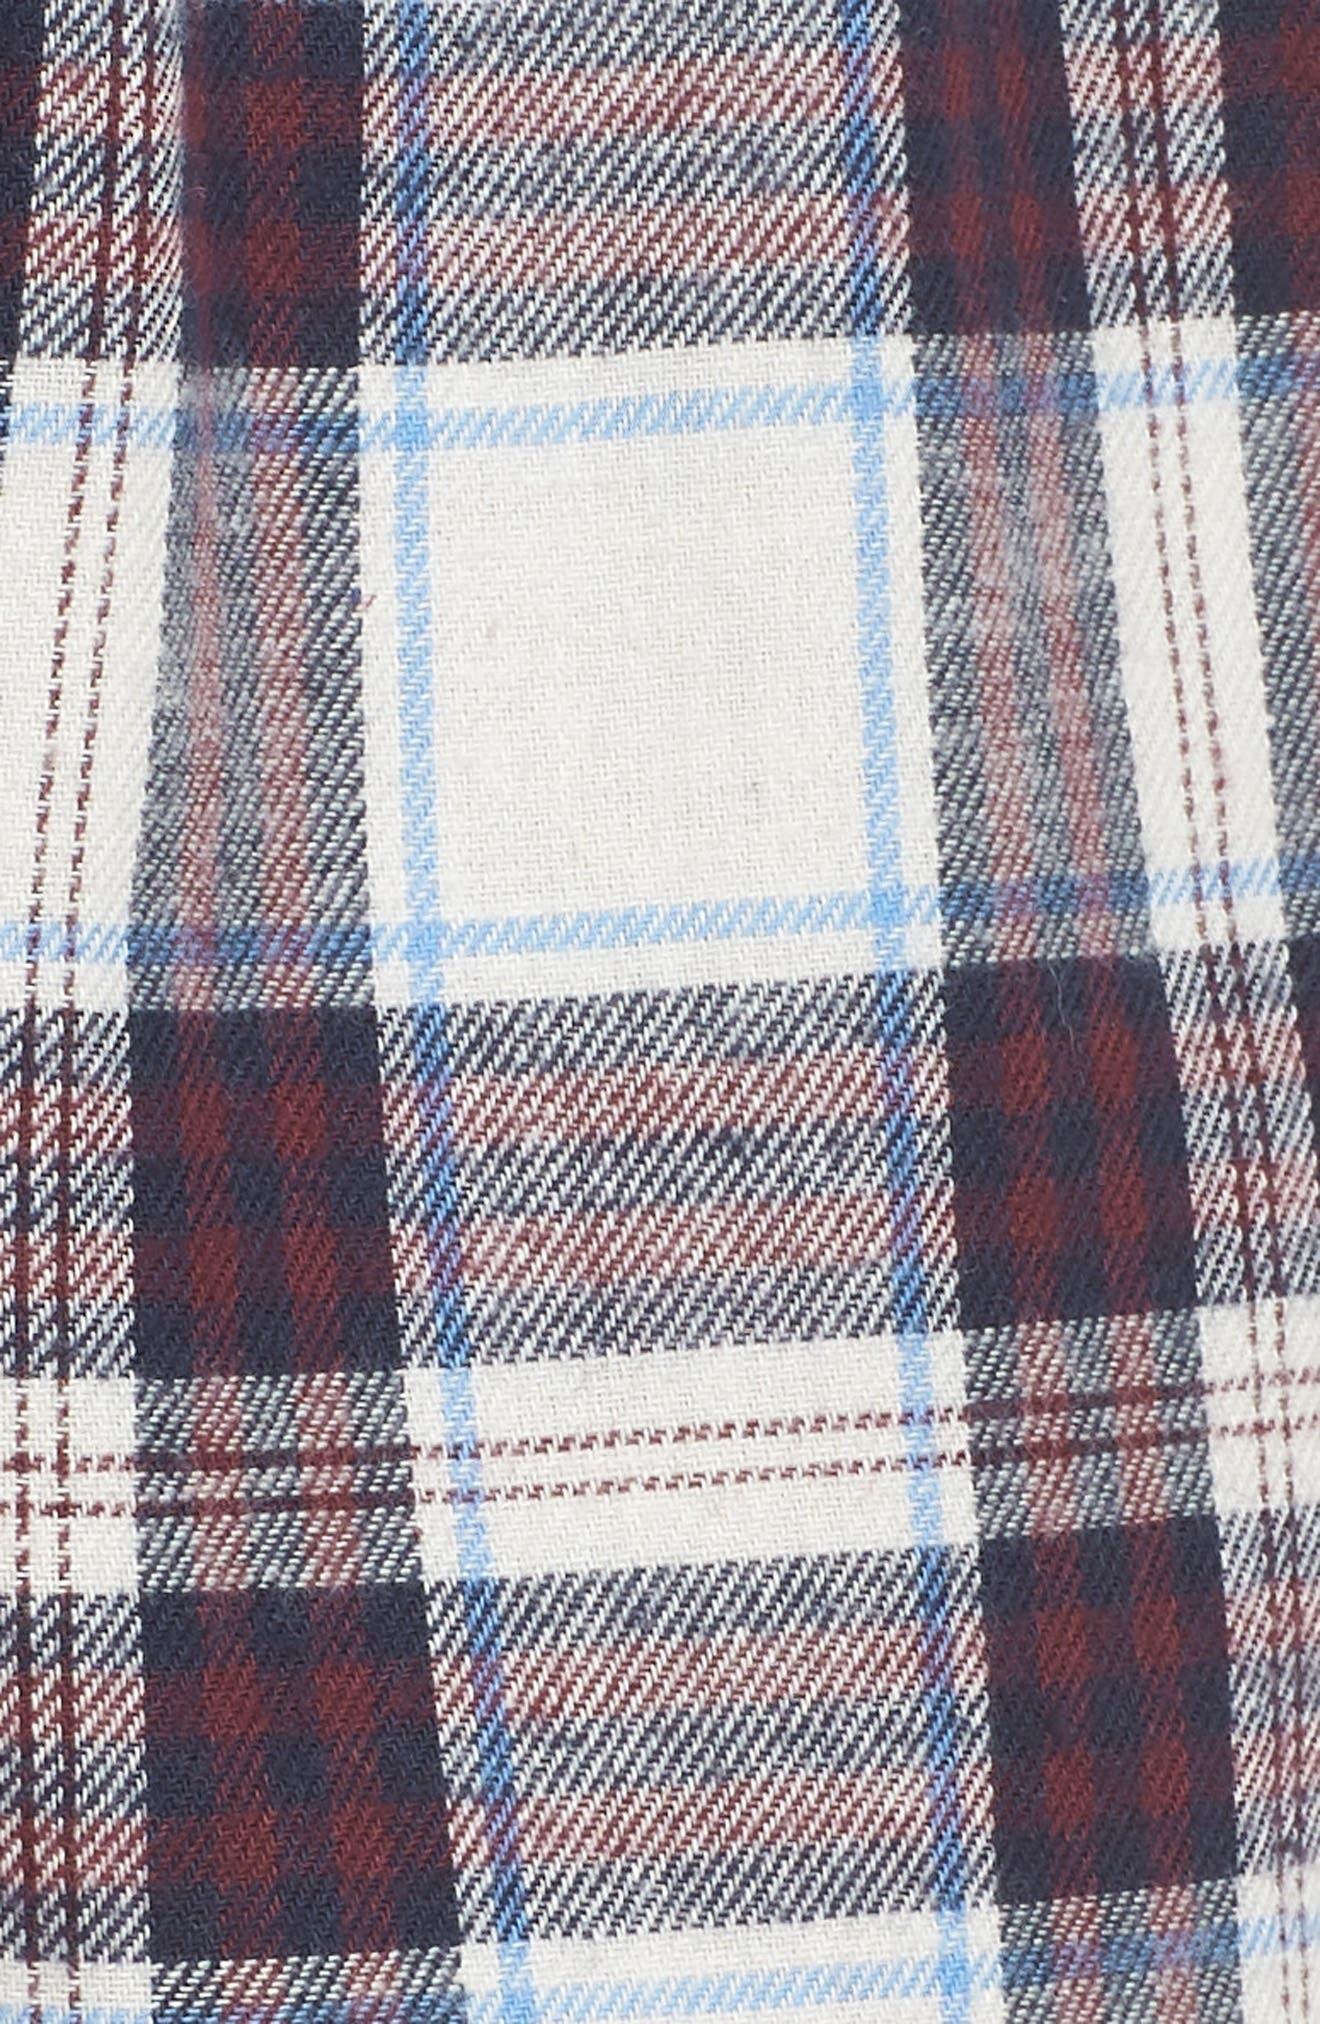 Plaid Pajama Shorts,                             Alternate thumbnail 5, color,                             SWEET DREAMS FIG TARTAN